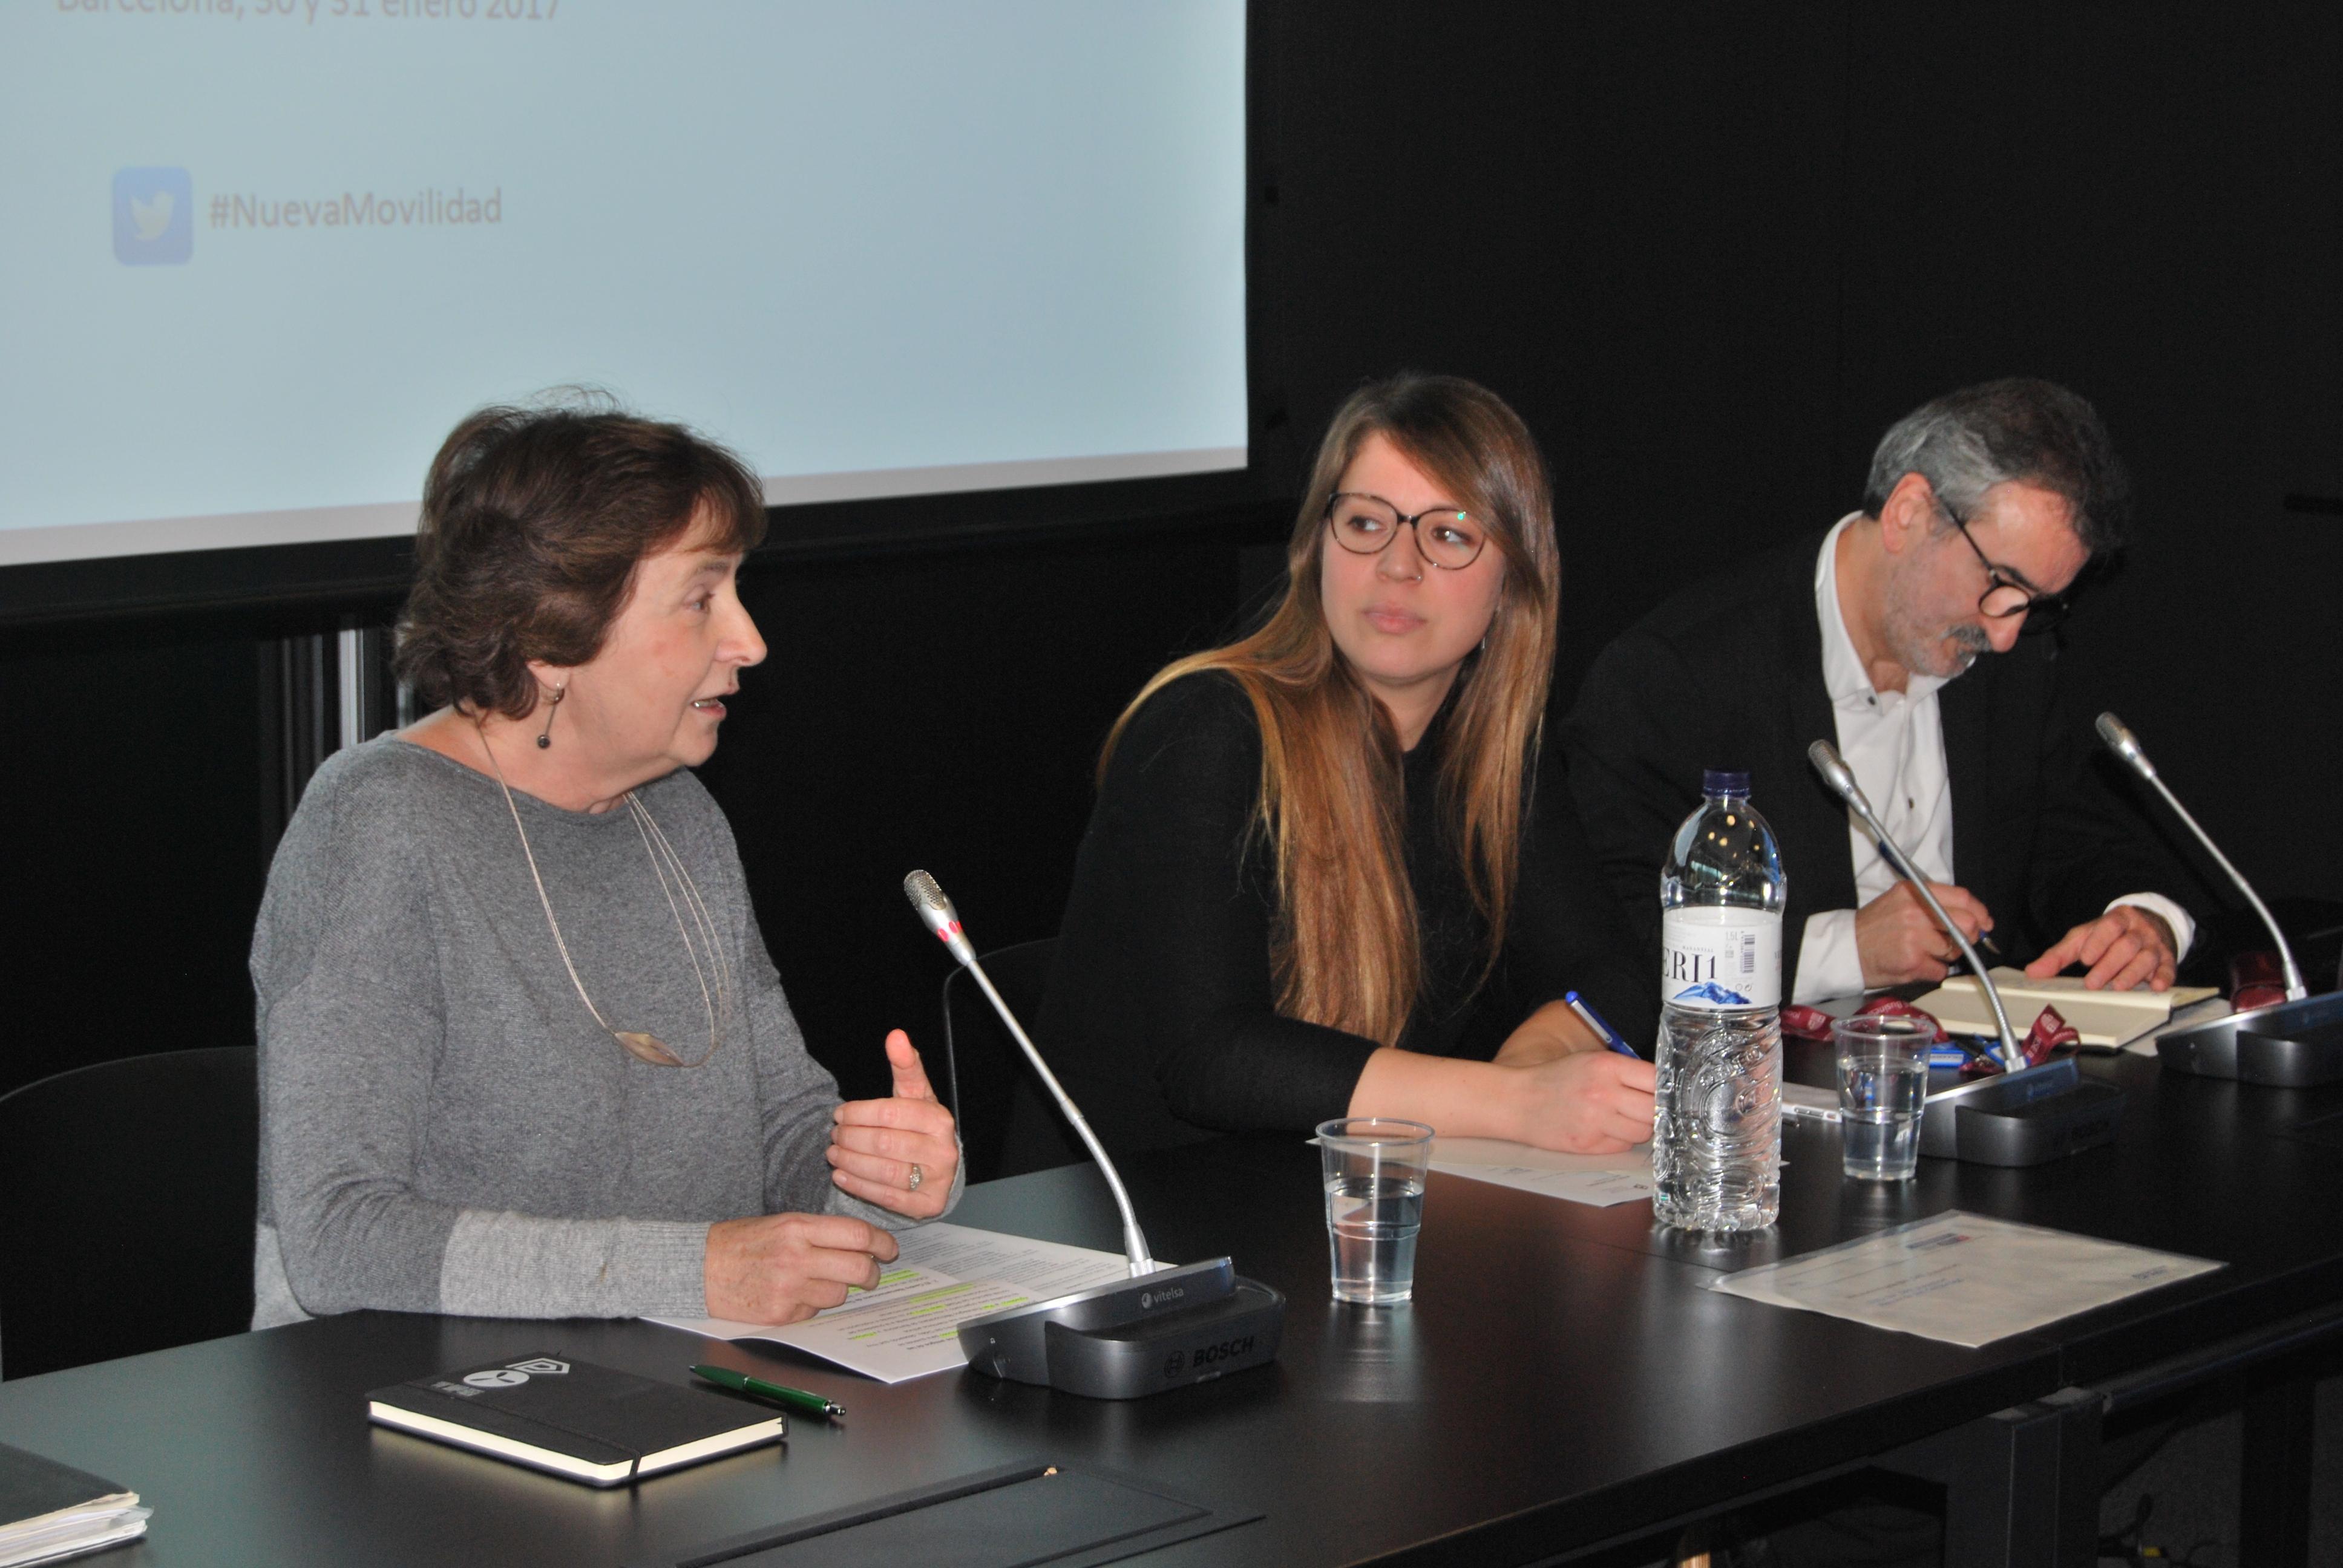 Janet Sanz, Maravillas Rojo i Kepa-Korta donen la benvinguda